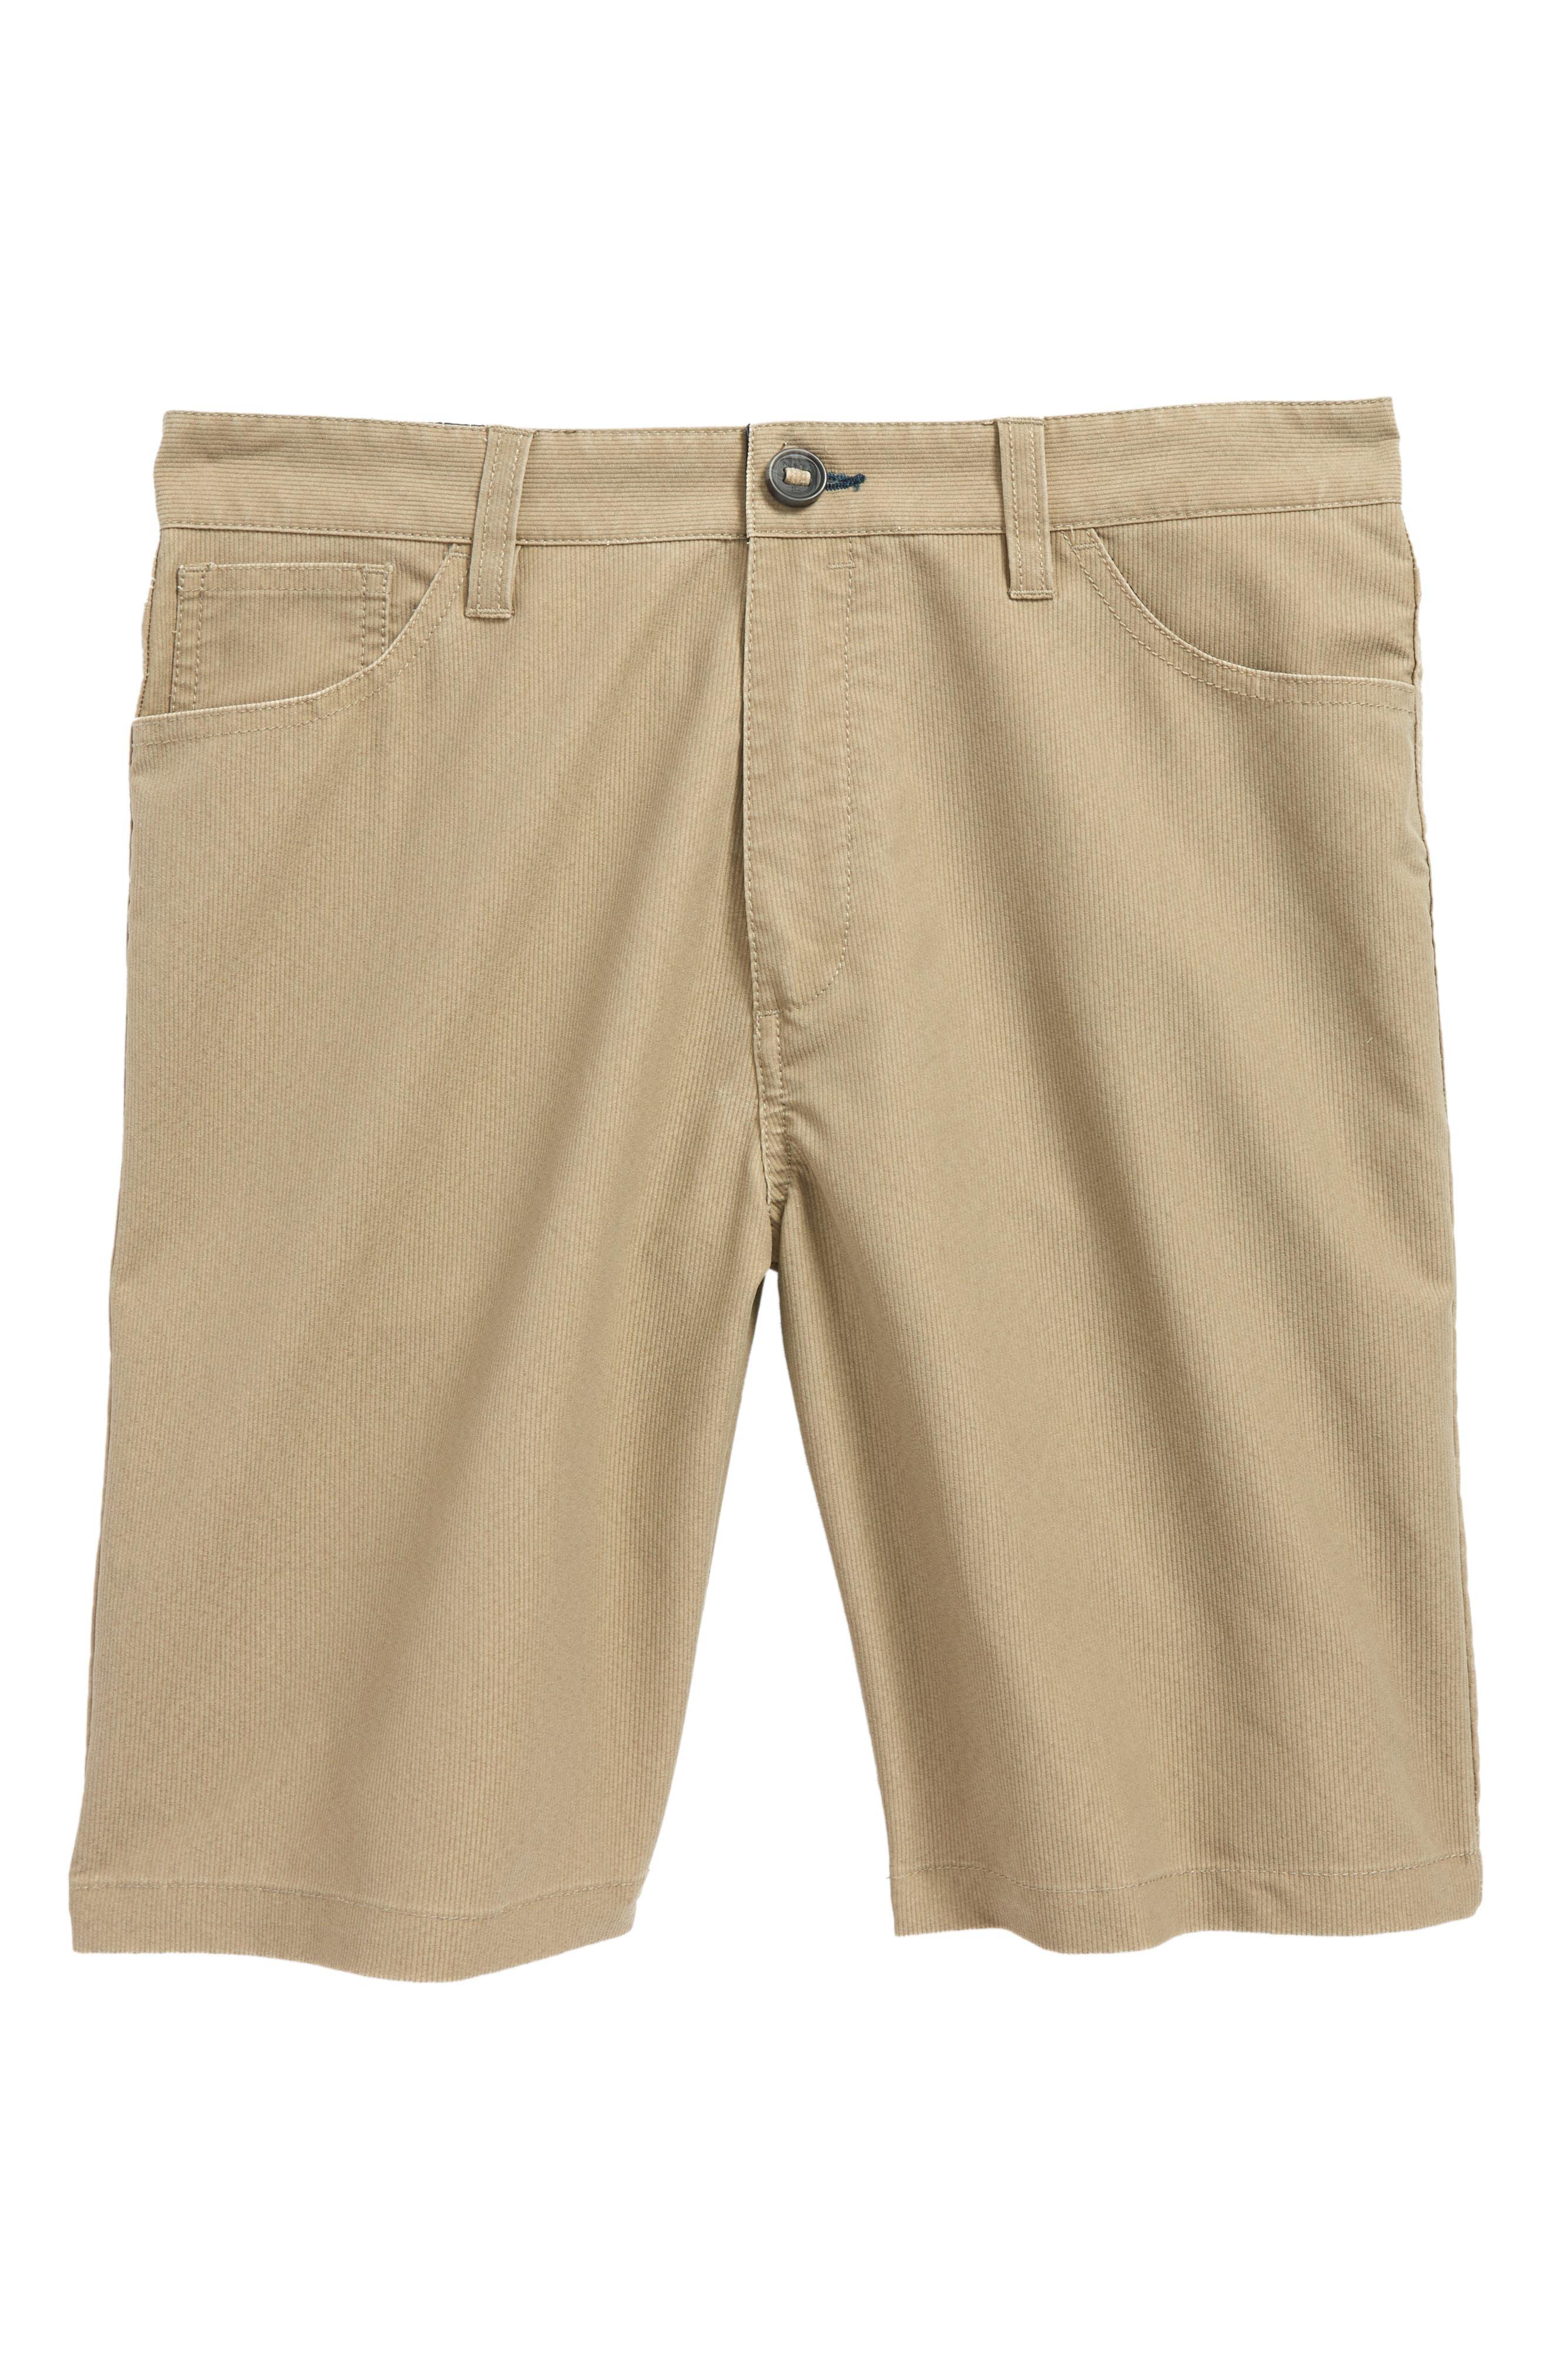 Outsider X Surf Corduroy Hybrid Shorts,                         Main,                         color, 259